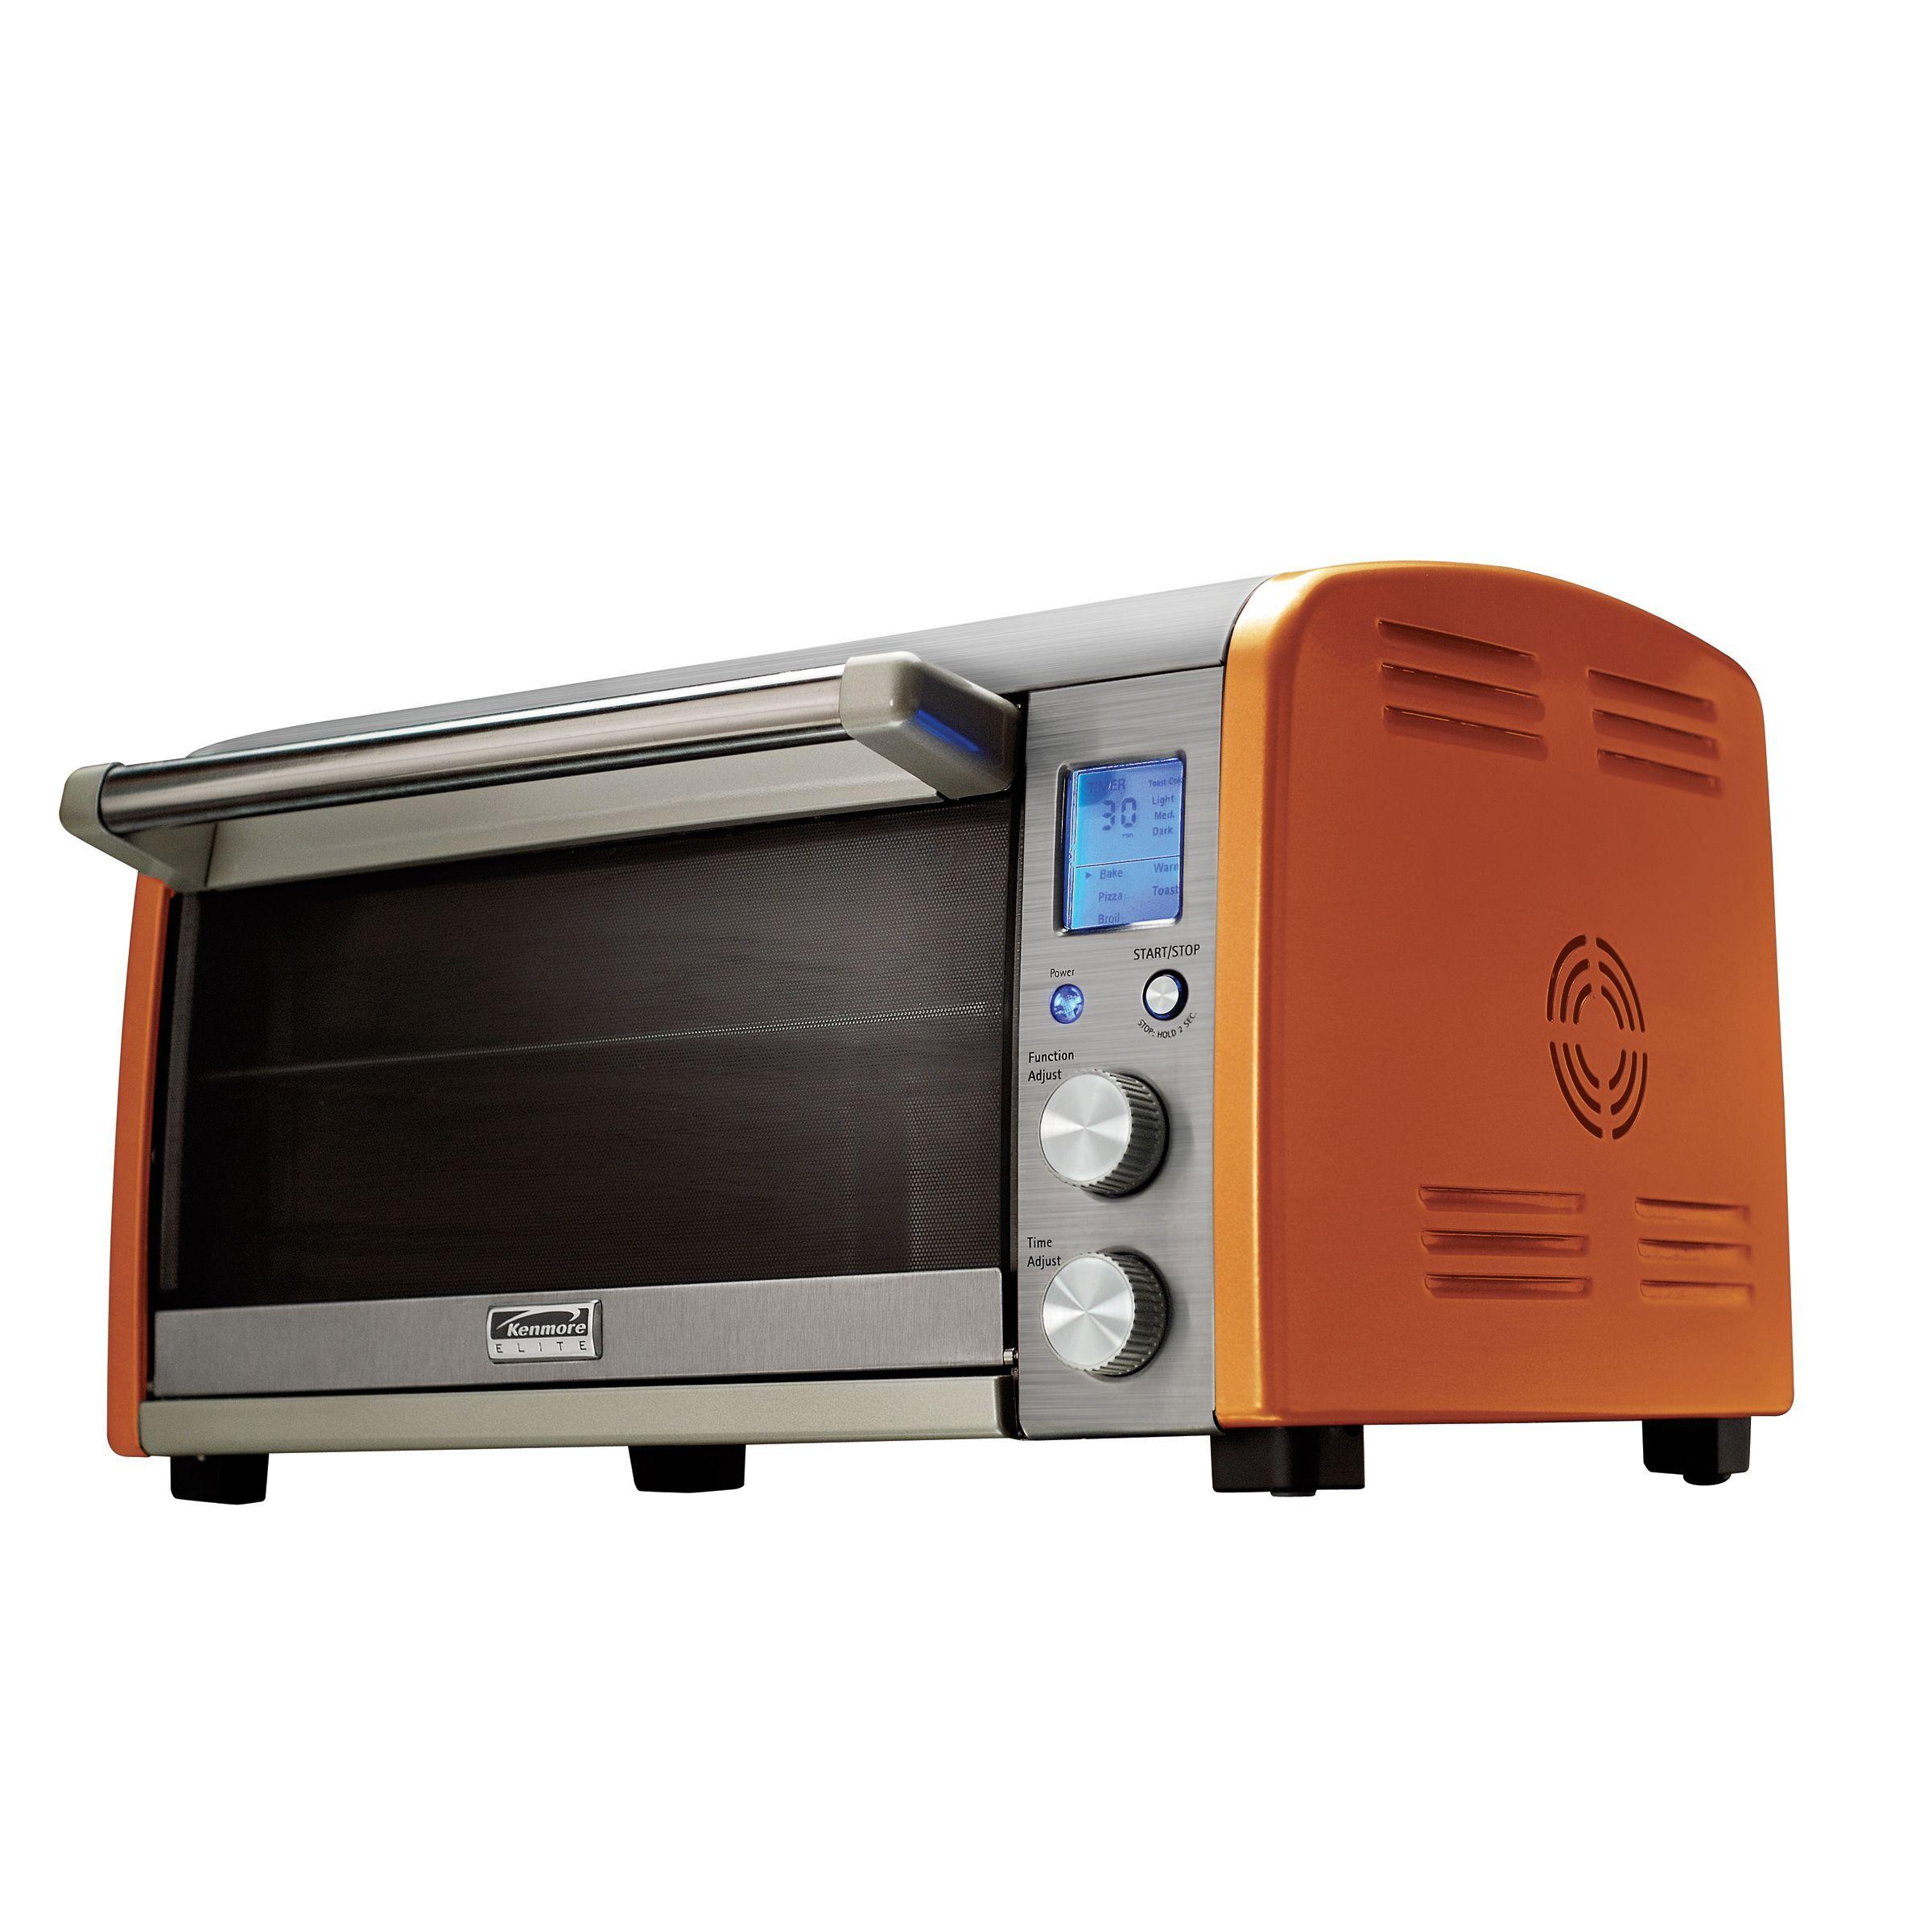 Uncategorized Elite Kitchen Appliances copper kenmore elite infrared convection toaster oven kitchen